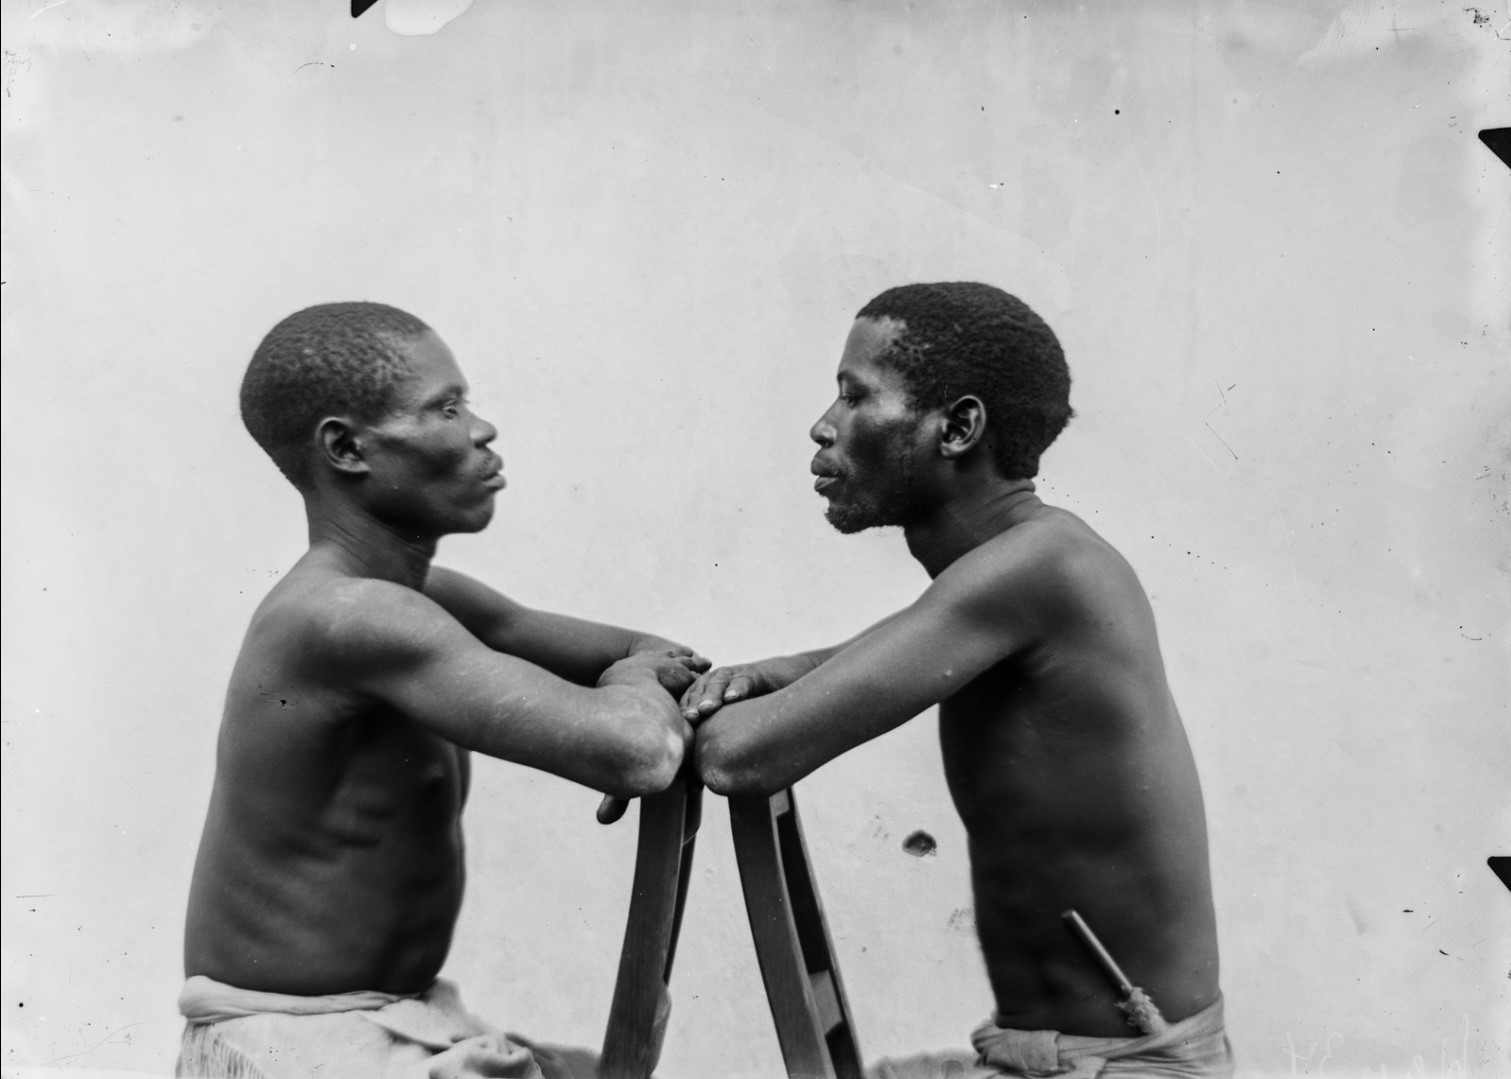 92. Антропометрическое изображение мужчин маконде и яо